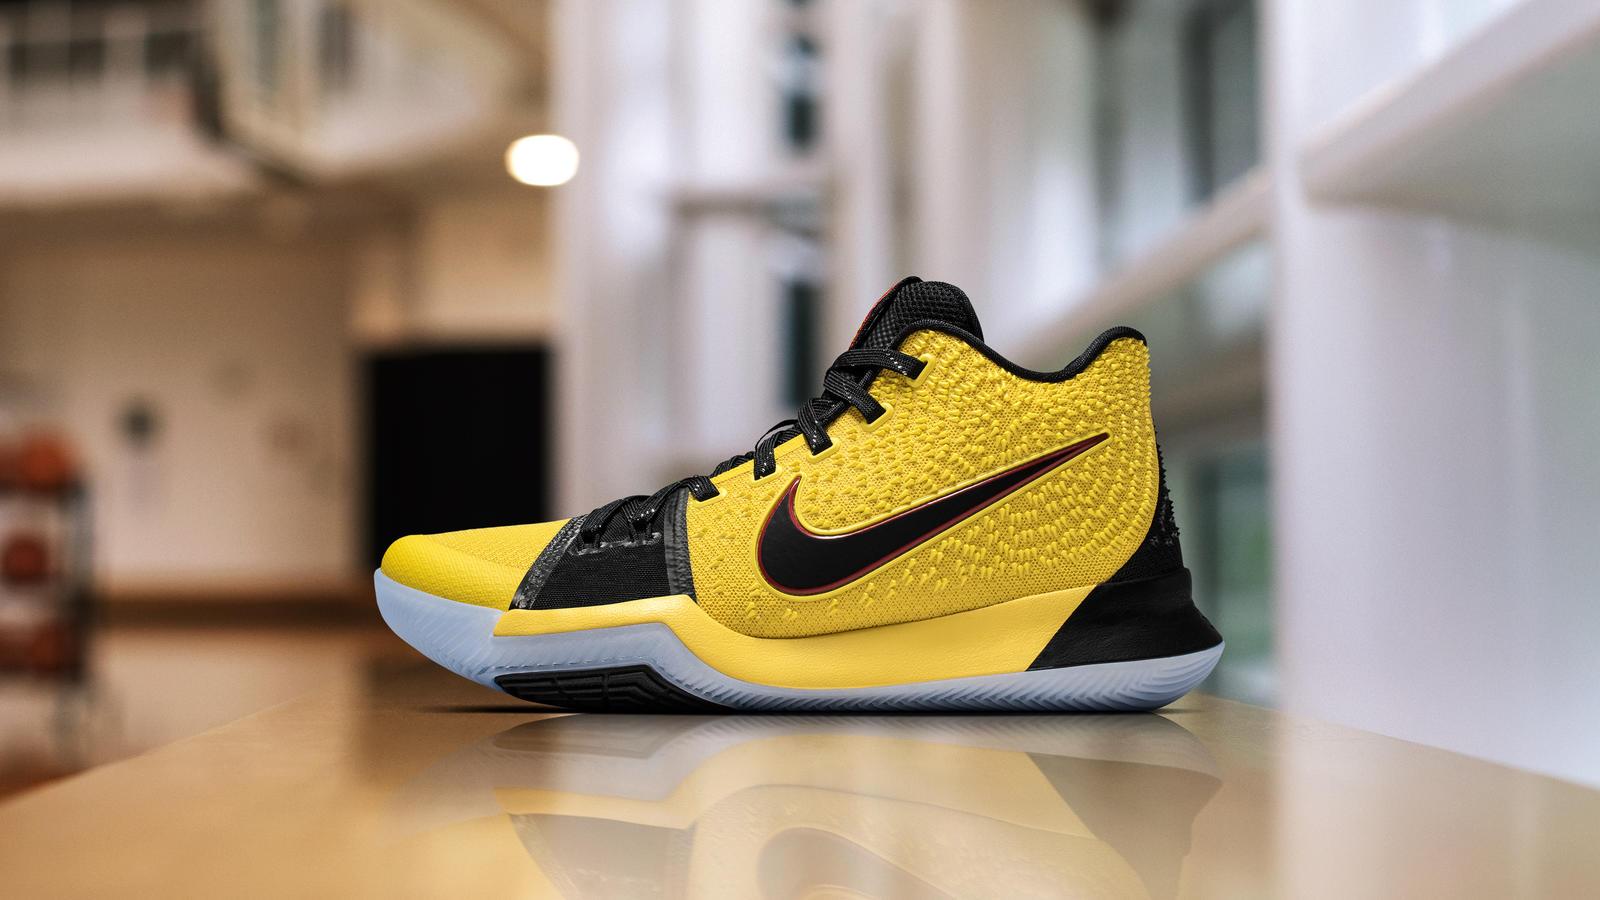 new products 6c69b b3ad1 KYRIE 3 PE - Nike News